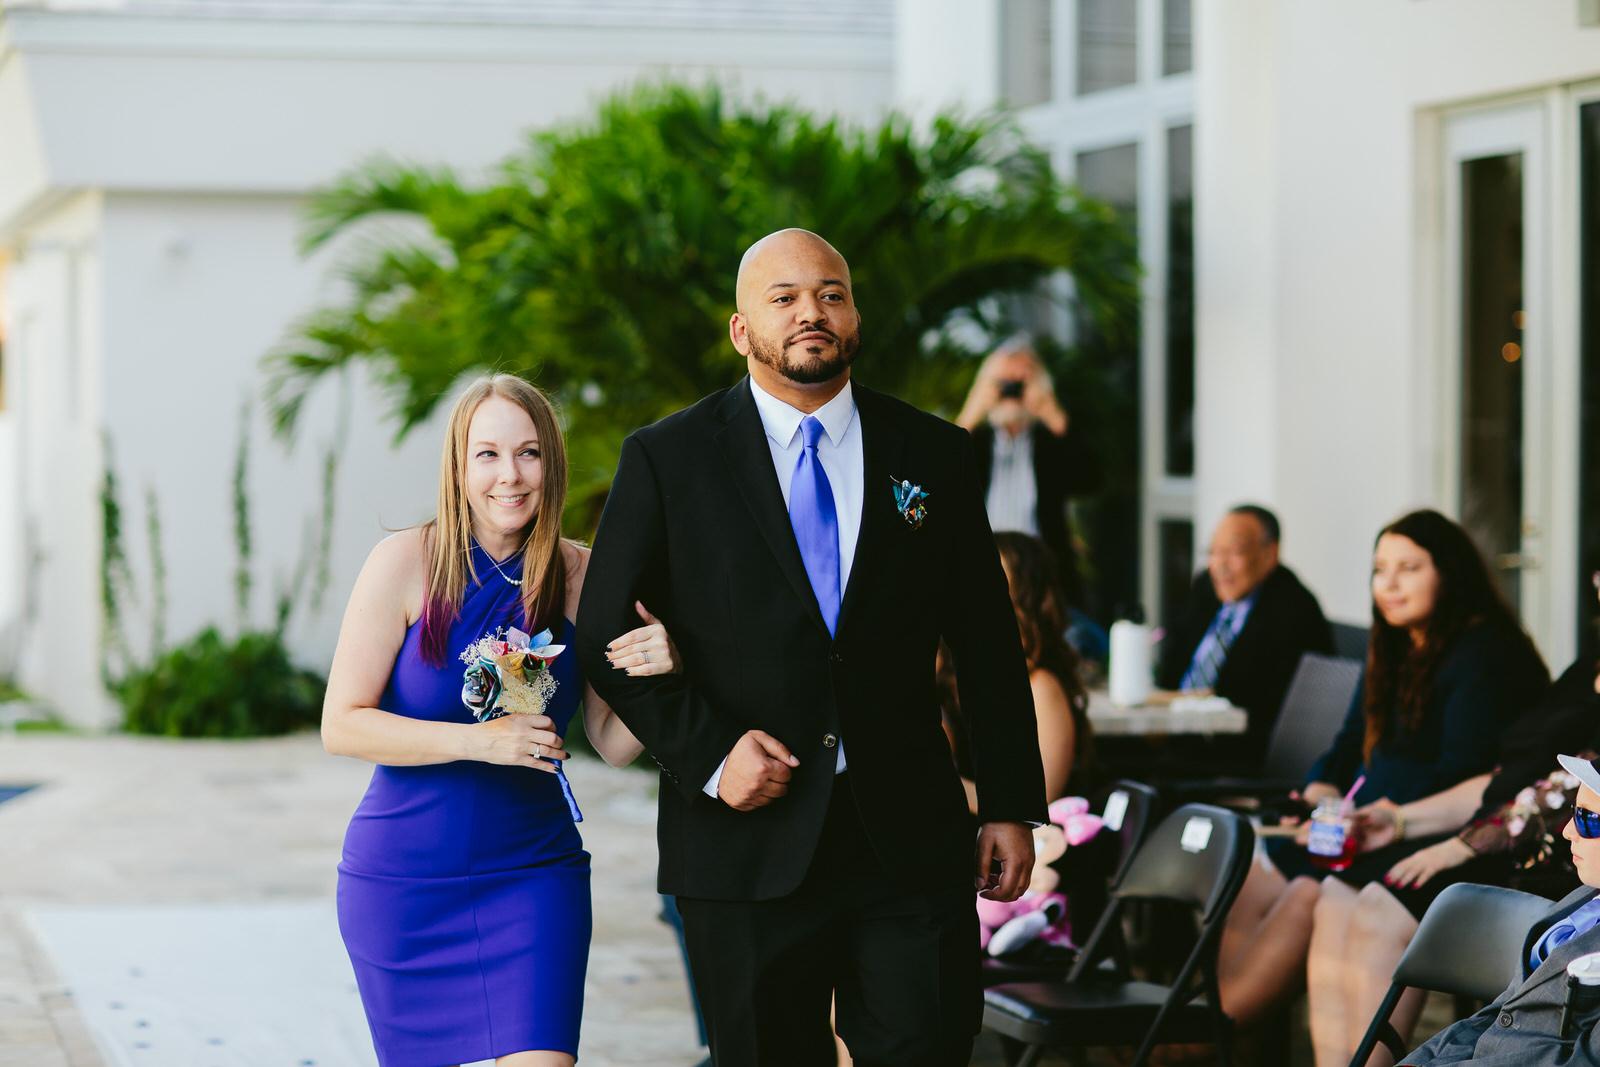 wedding-ceremony-walk-backyard-diy-weddings.jpg